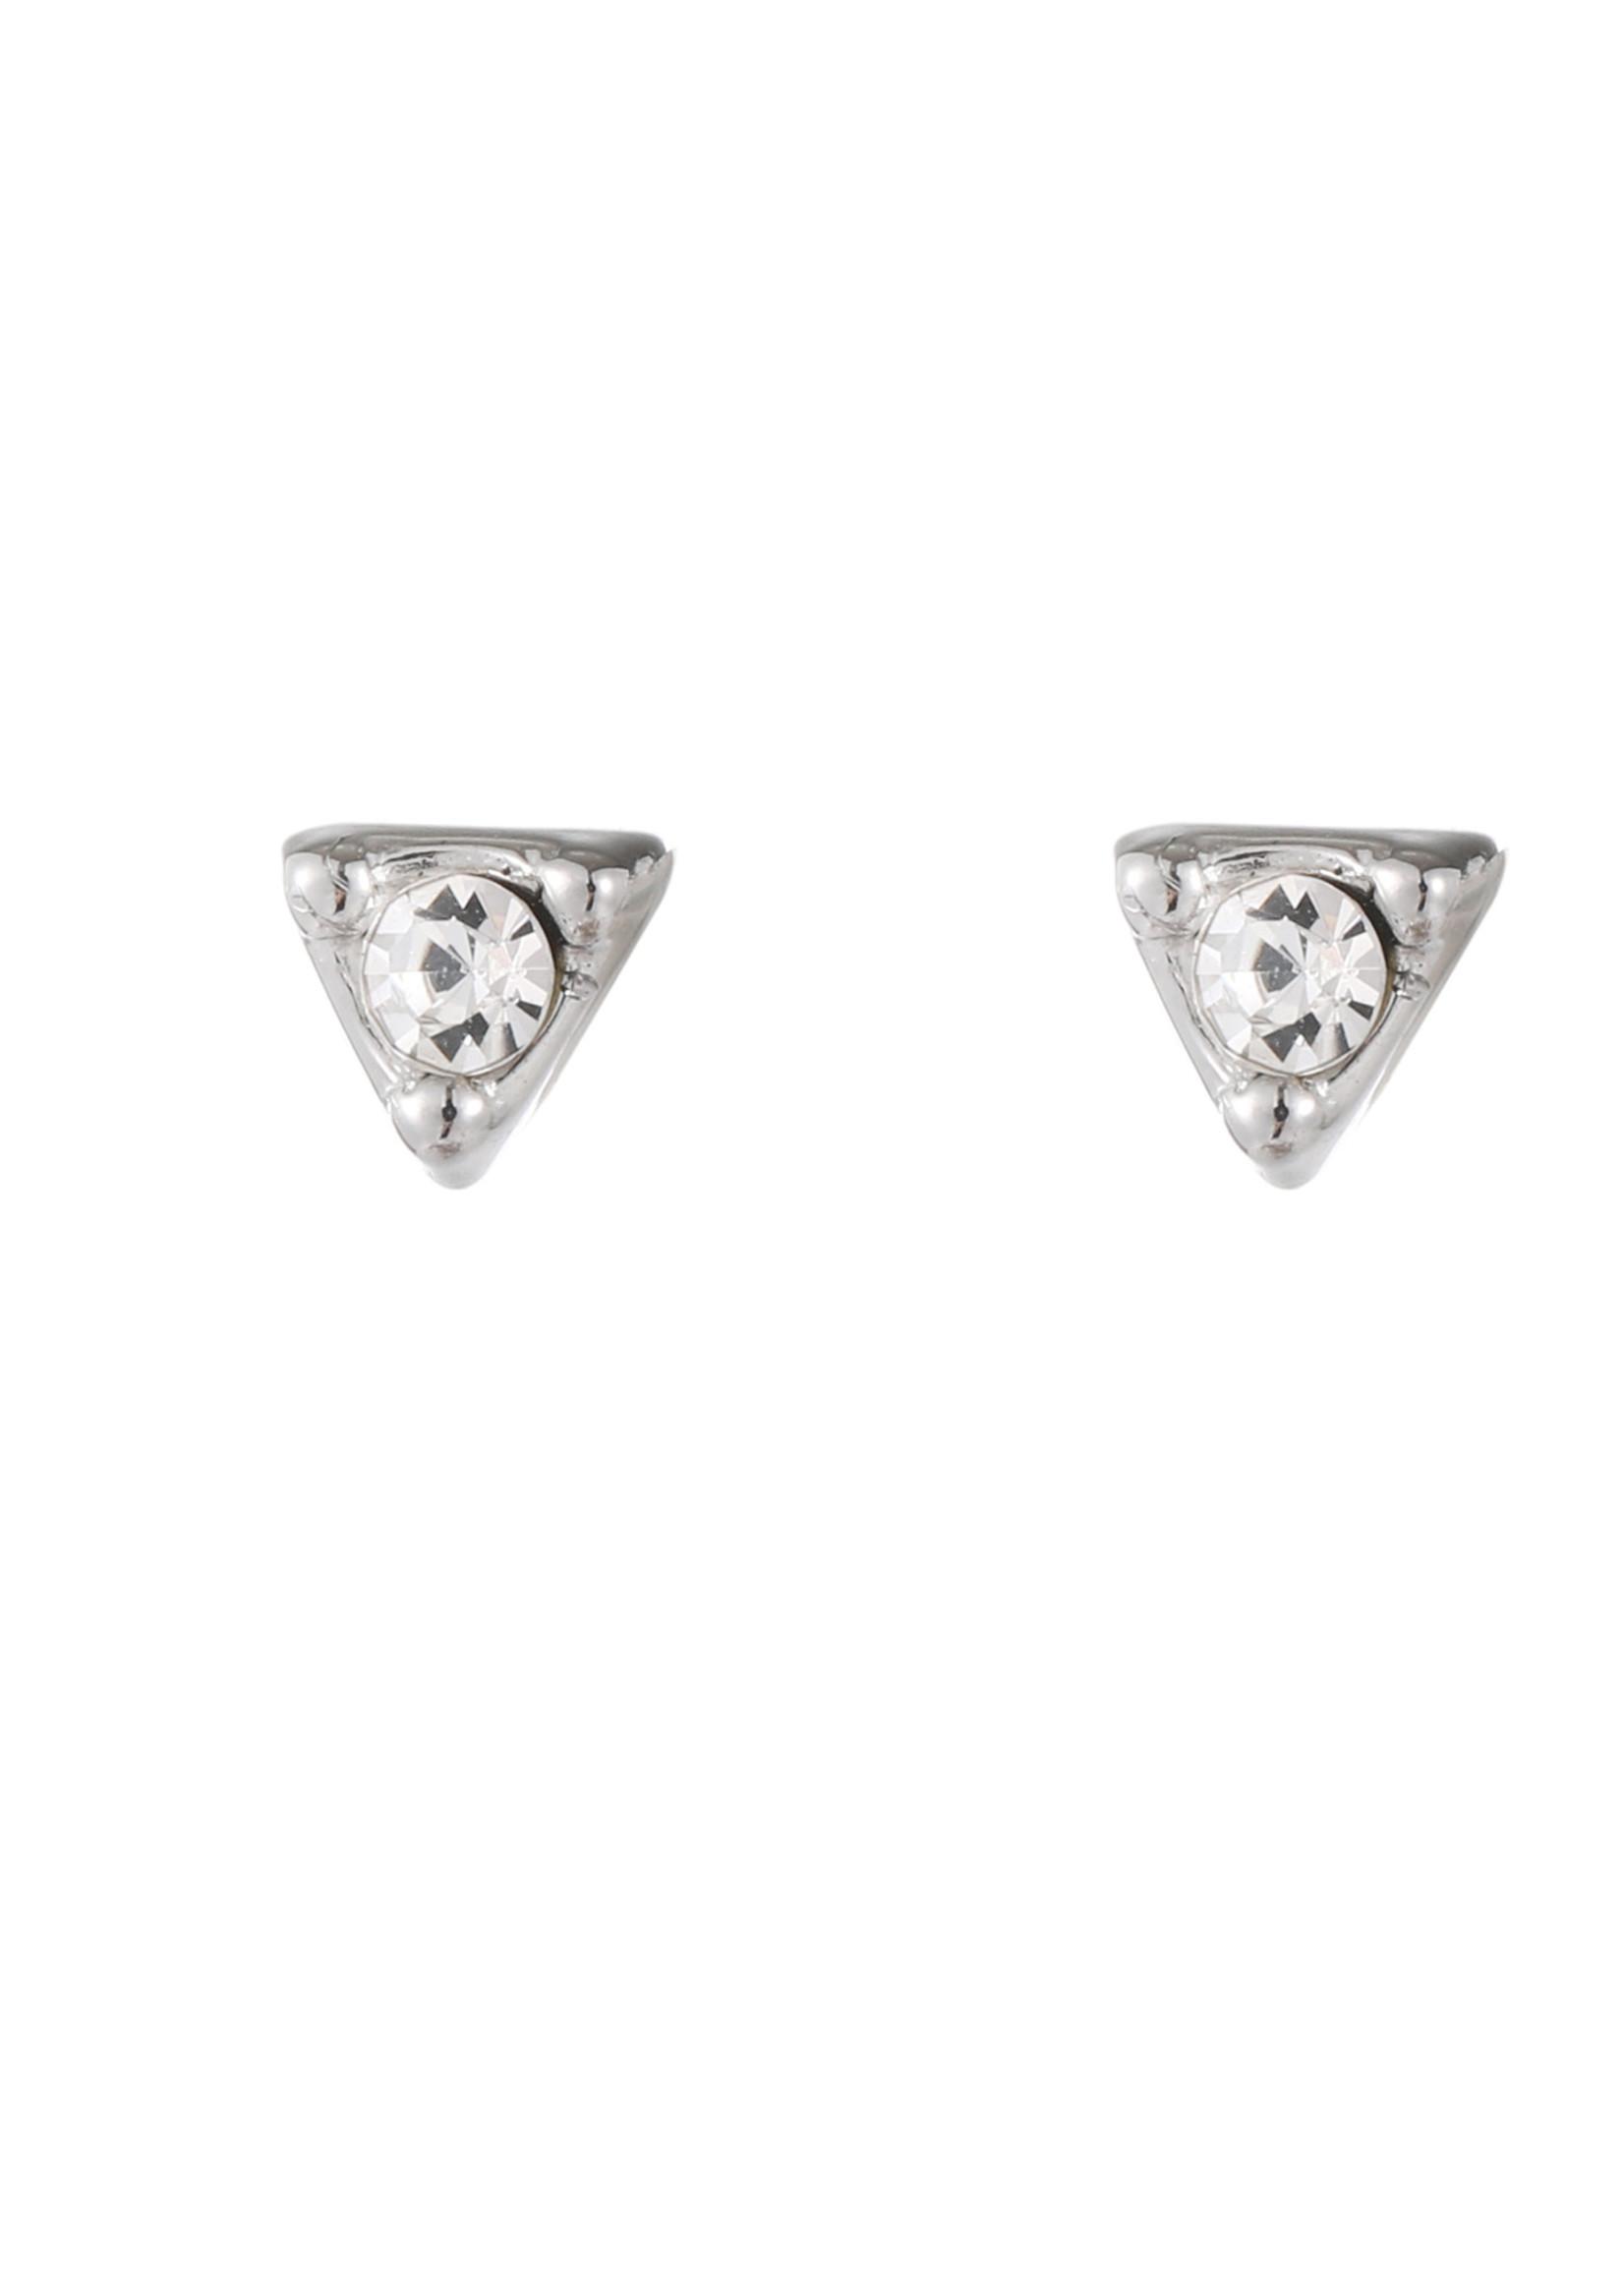 Oorbel zilver driehoek met crystal steen E1783-1